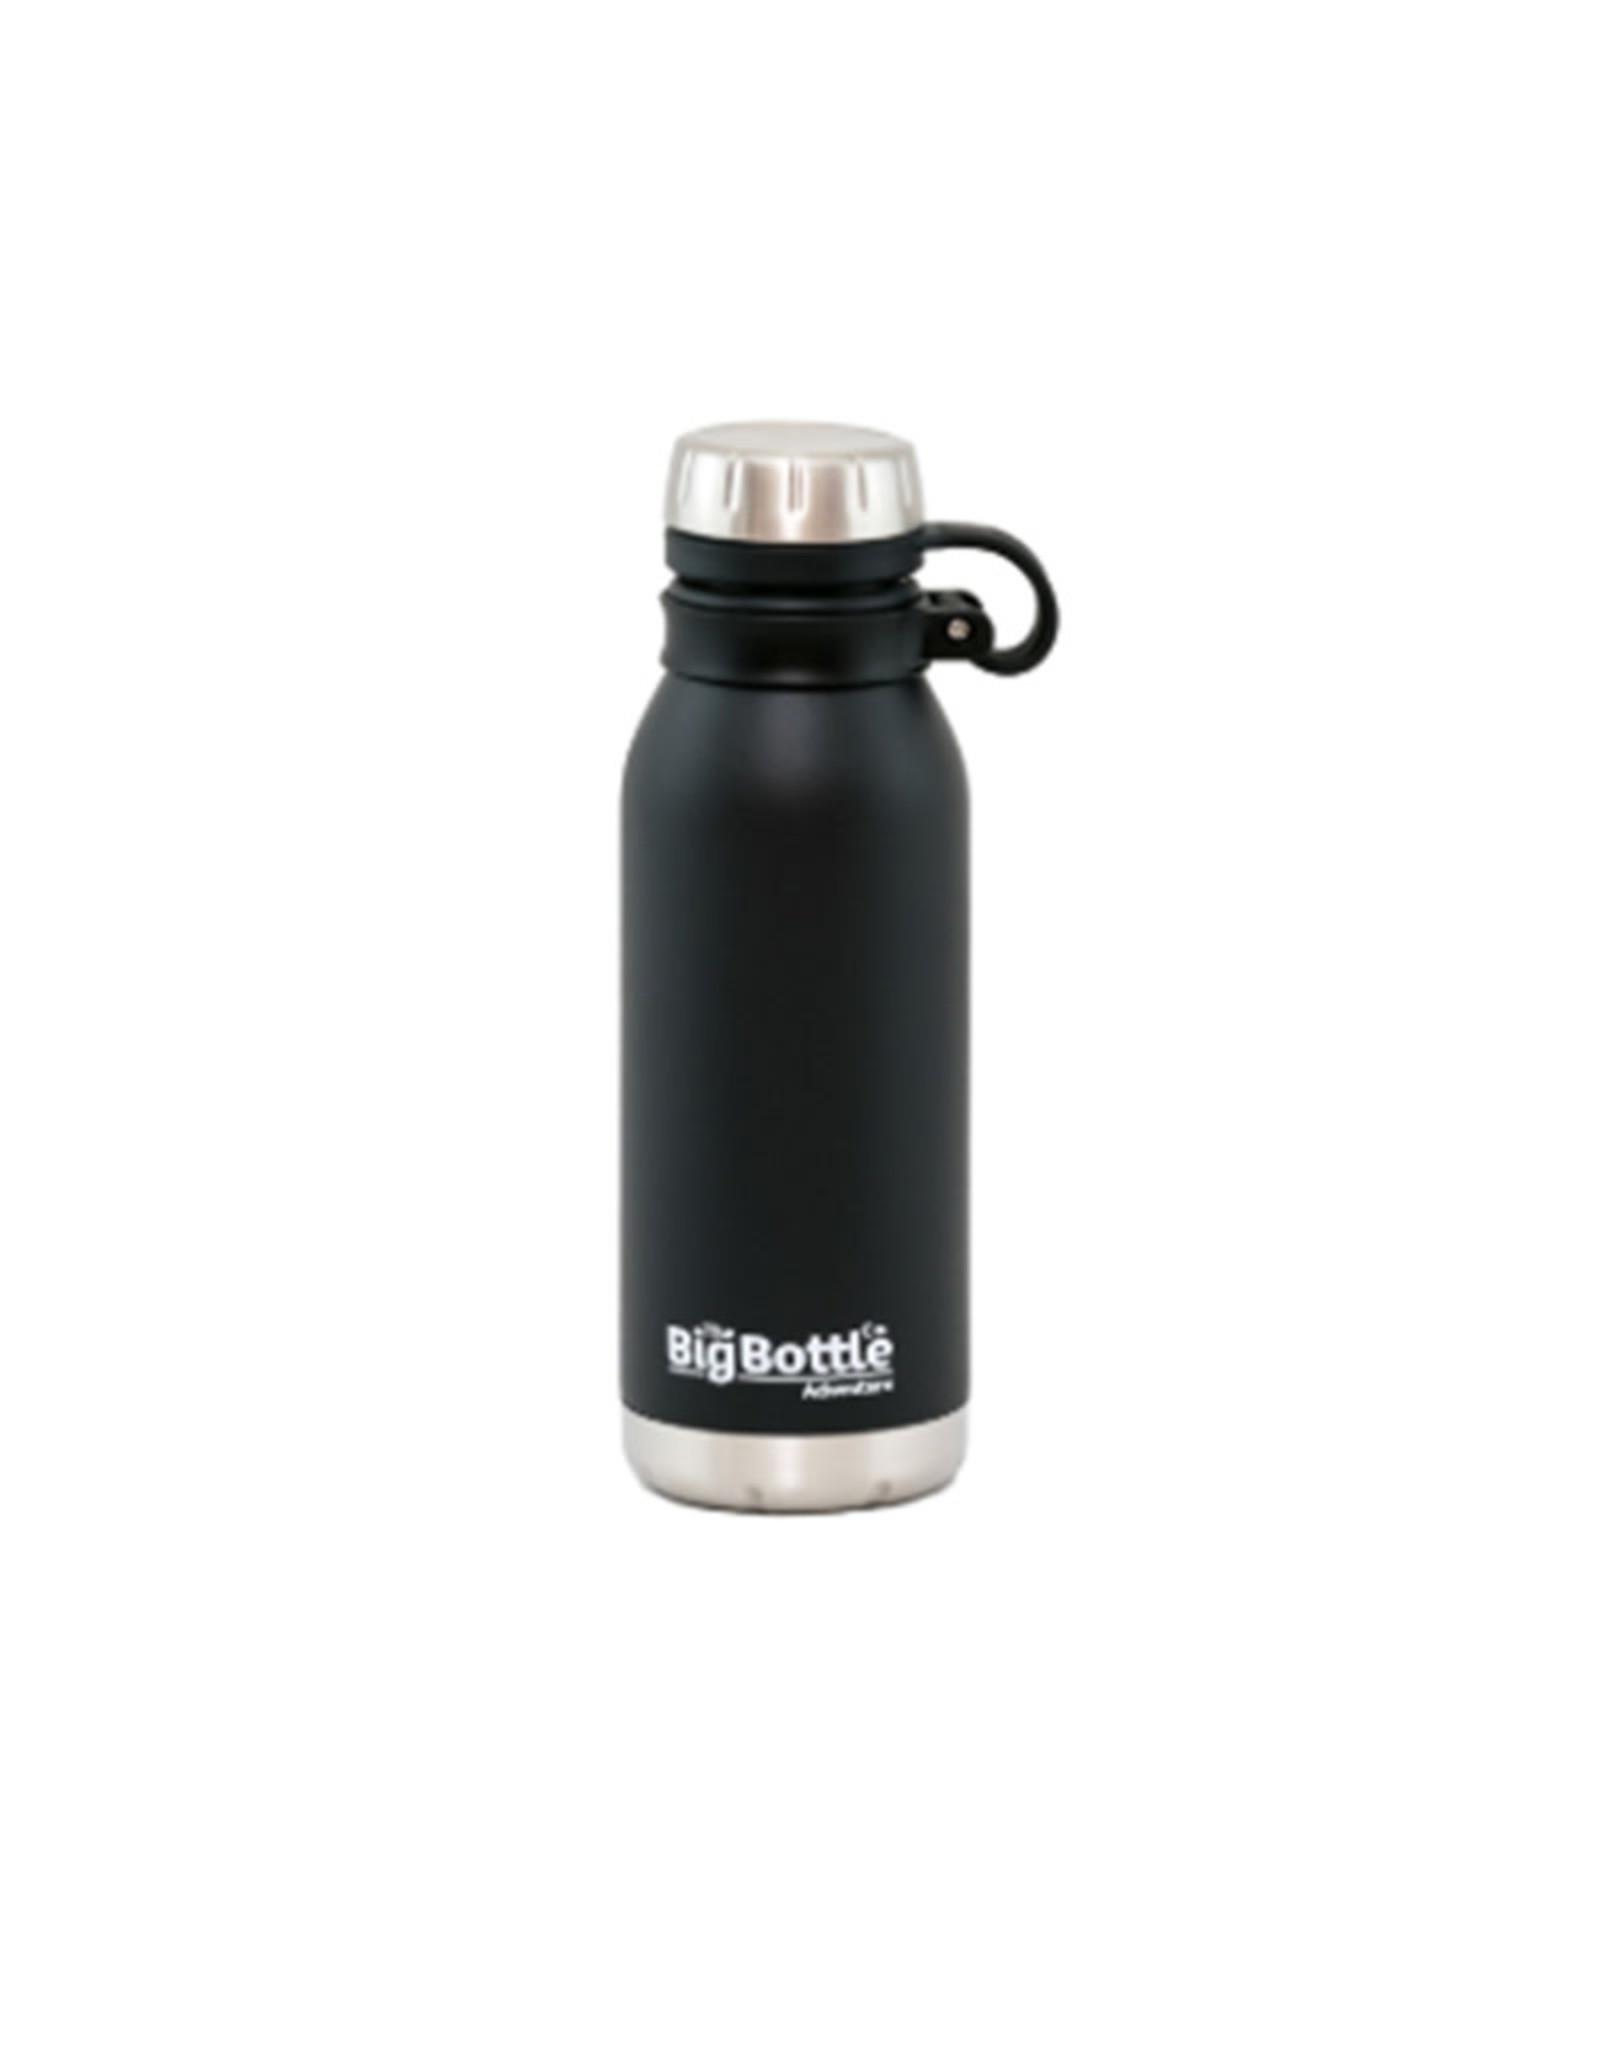 Big Bottle Co. Big Bottle Co. - Adventure Range, Jet Black Adventure (500ml)